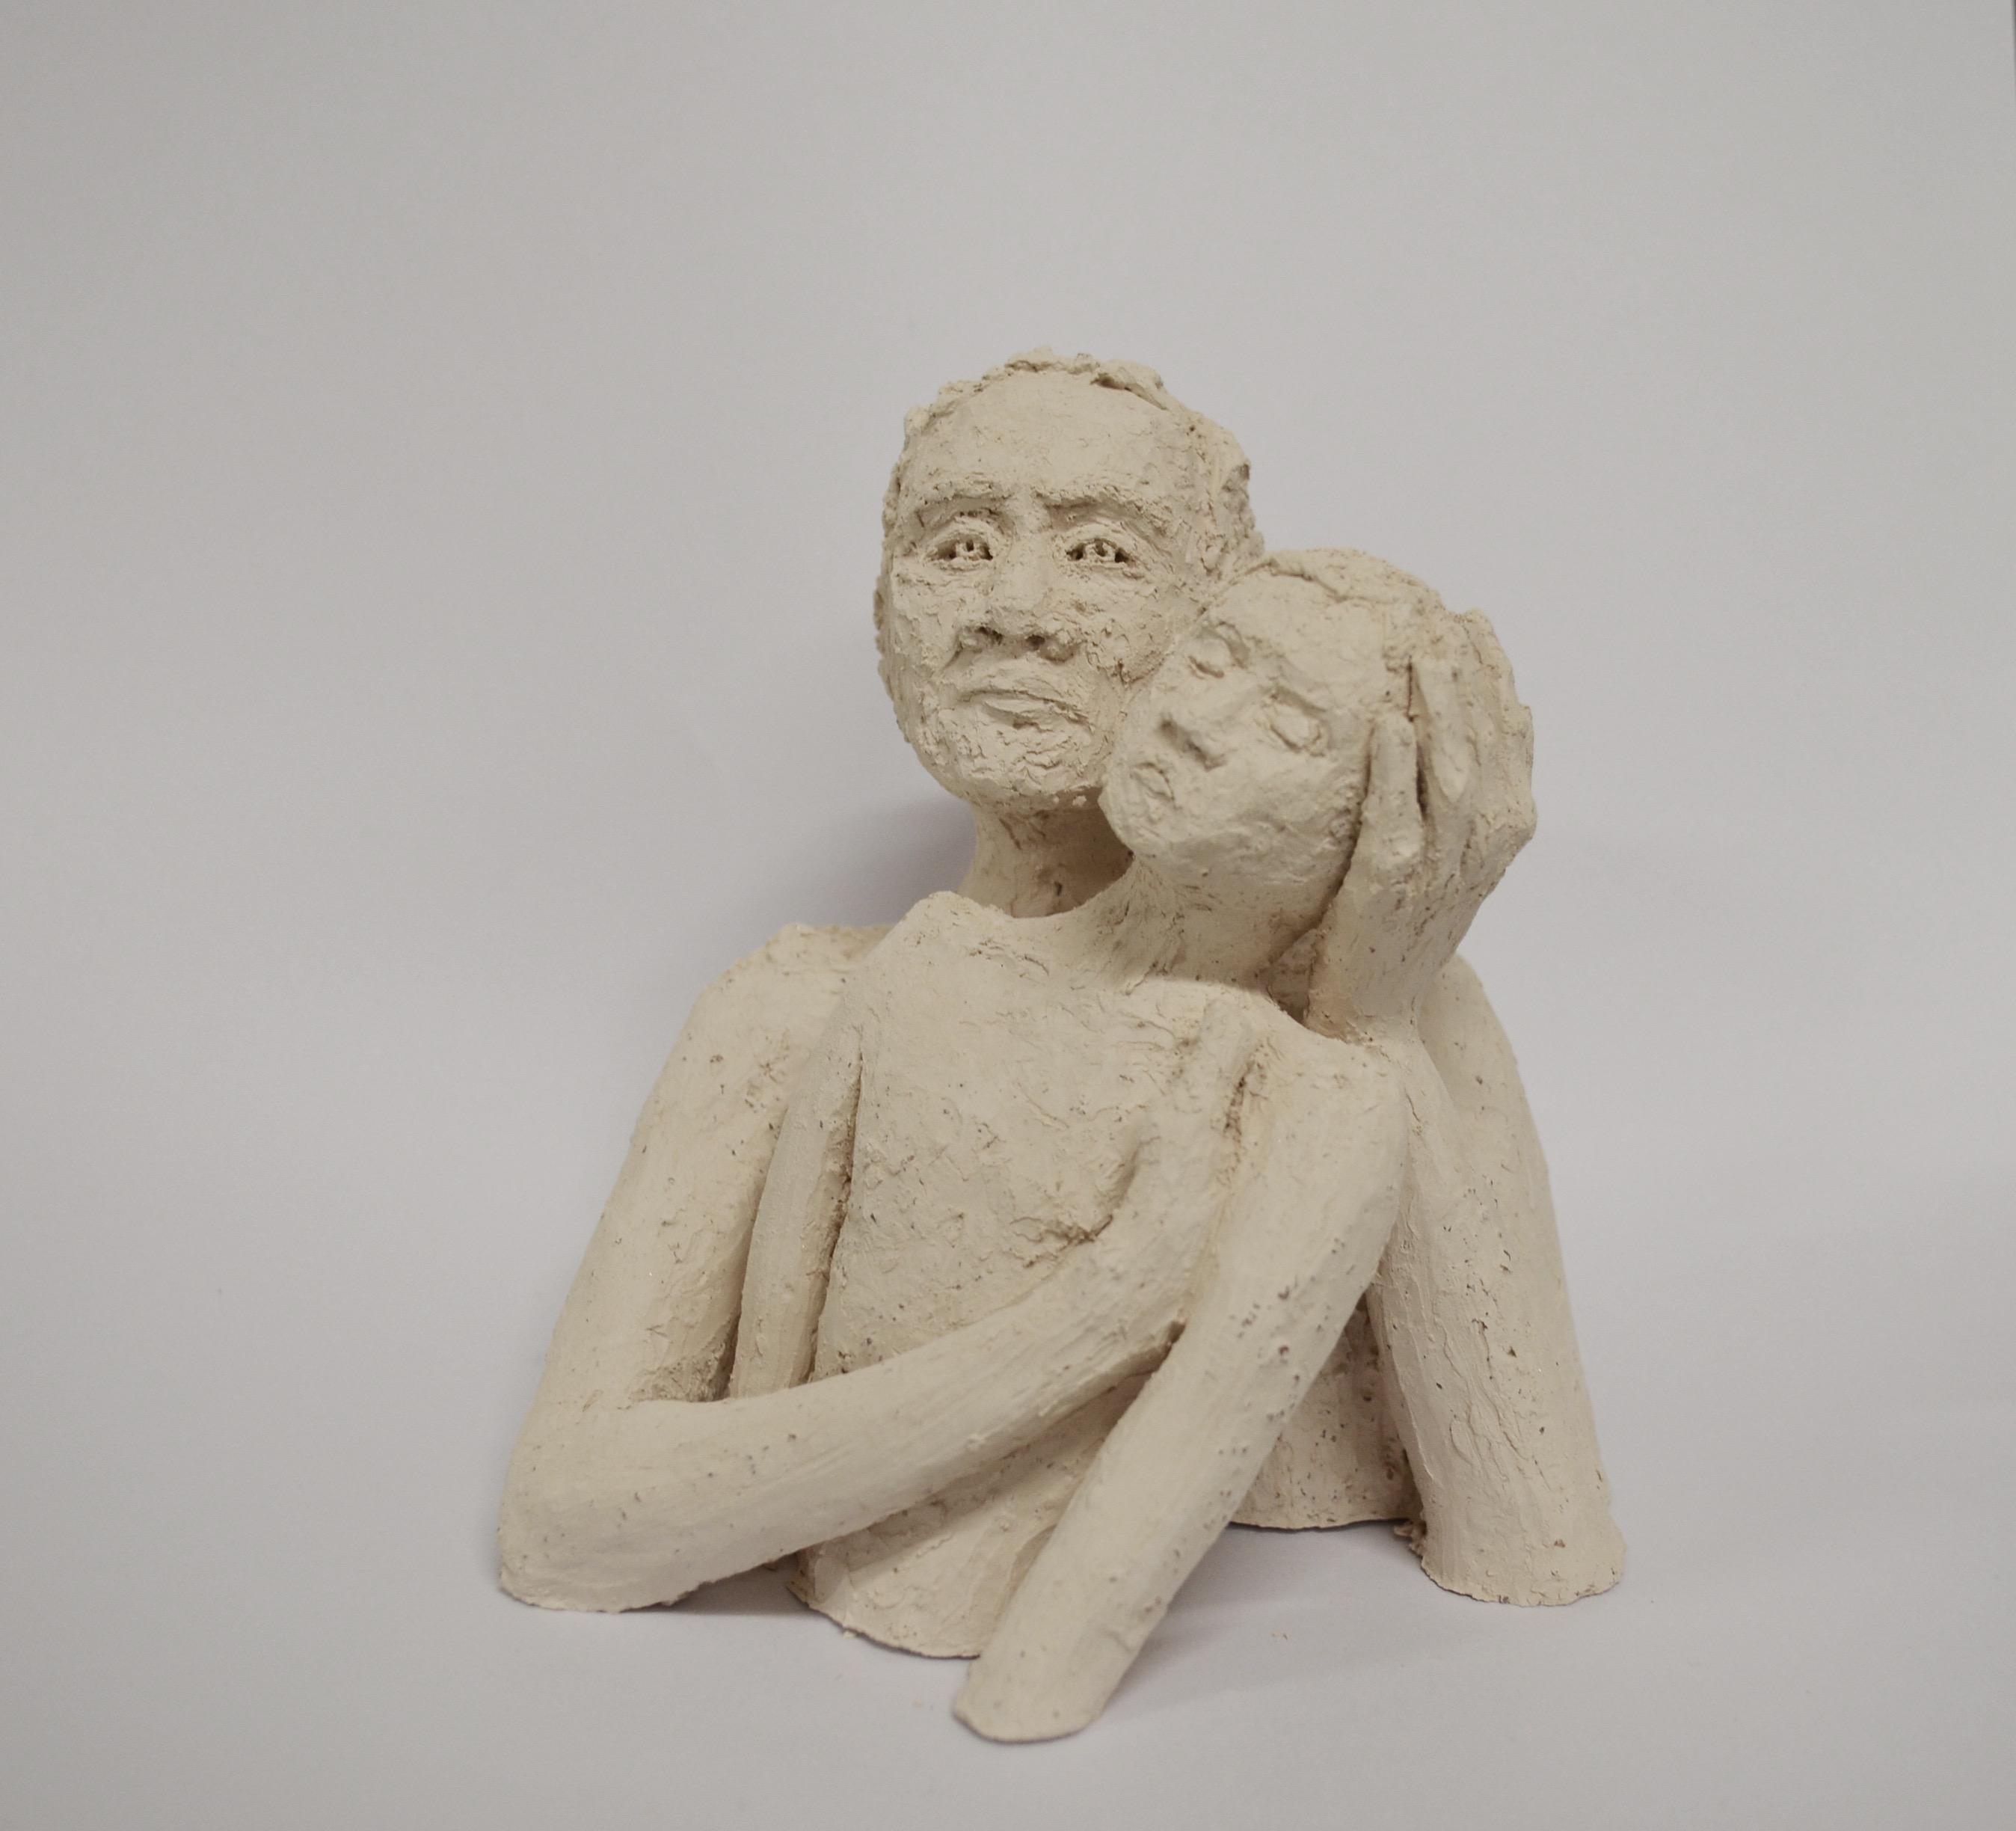 Conversations On Ceramics: with Lulu Senft